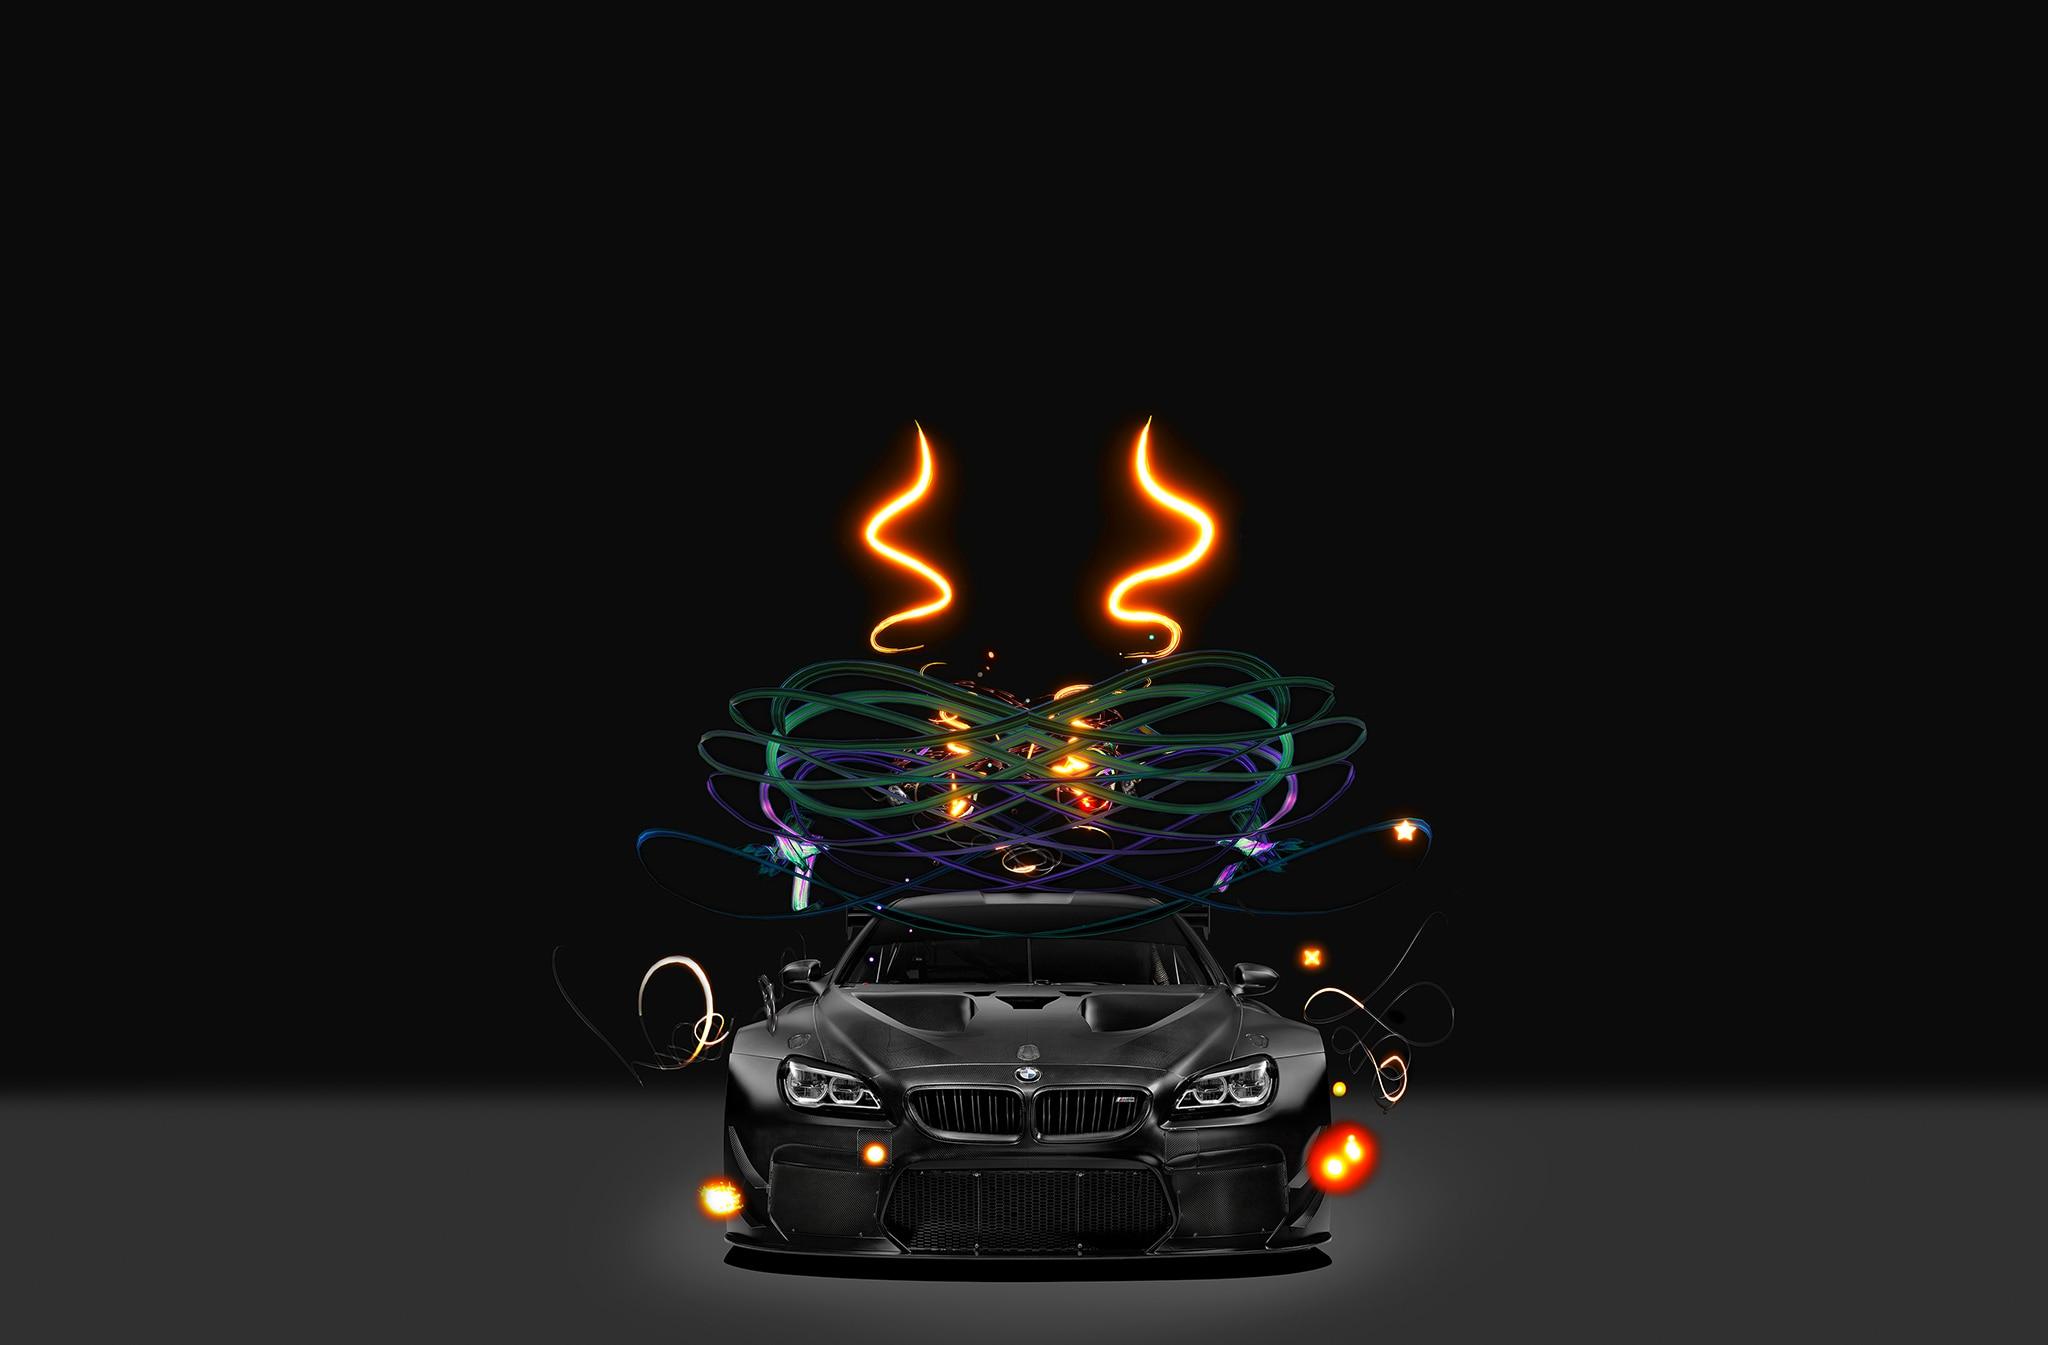 Image 29 of 50 2018 saratoga invitational auto show limited 2017 bmw m6 gt3 art car goes digital automobile magazine publicscrutiny Gallery